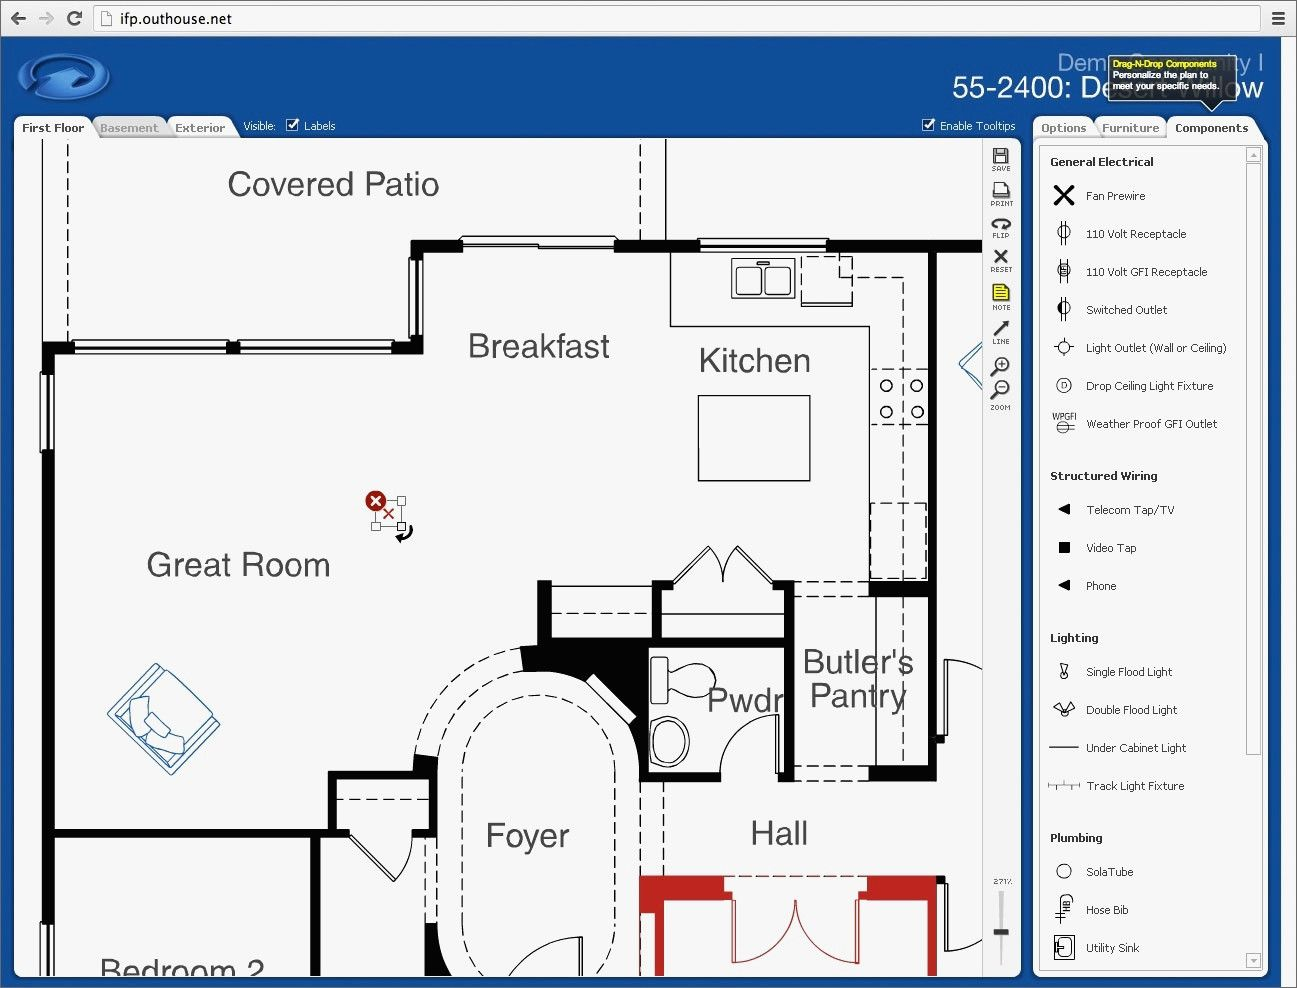 House Plan Creator Luxury 47 Awesome Floor Plan Creator App Floor Plan Drawing Apps Floor Plans Drawing House Plan Creator House Plan Maker Floor Plan Creator